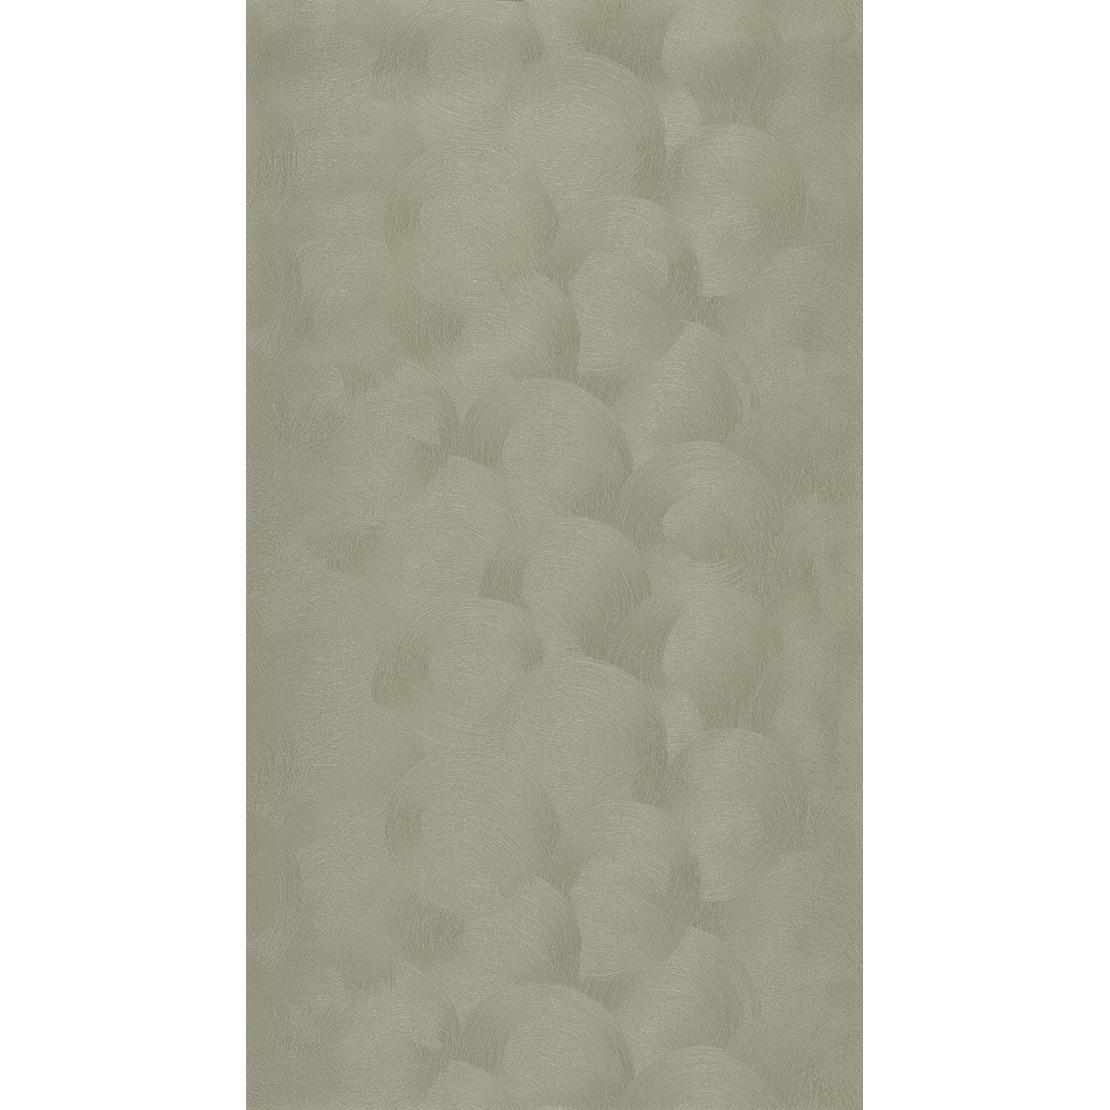 Французские обои Casadeco,  коллекция Oxyde, артикулOXY29142128